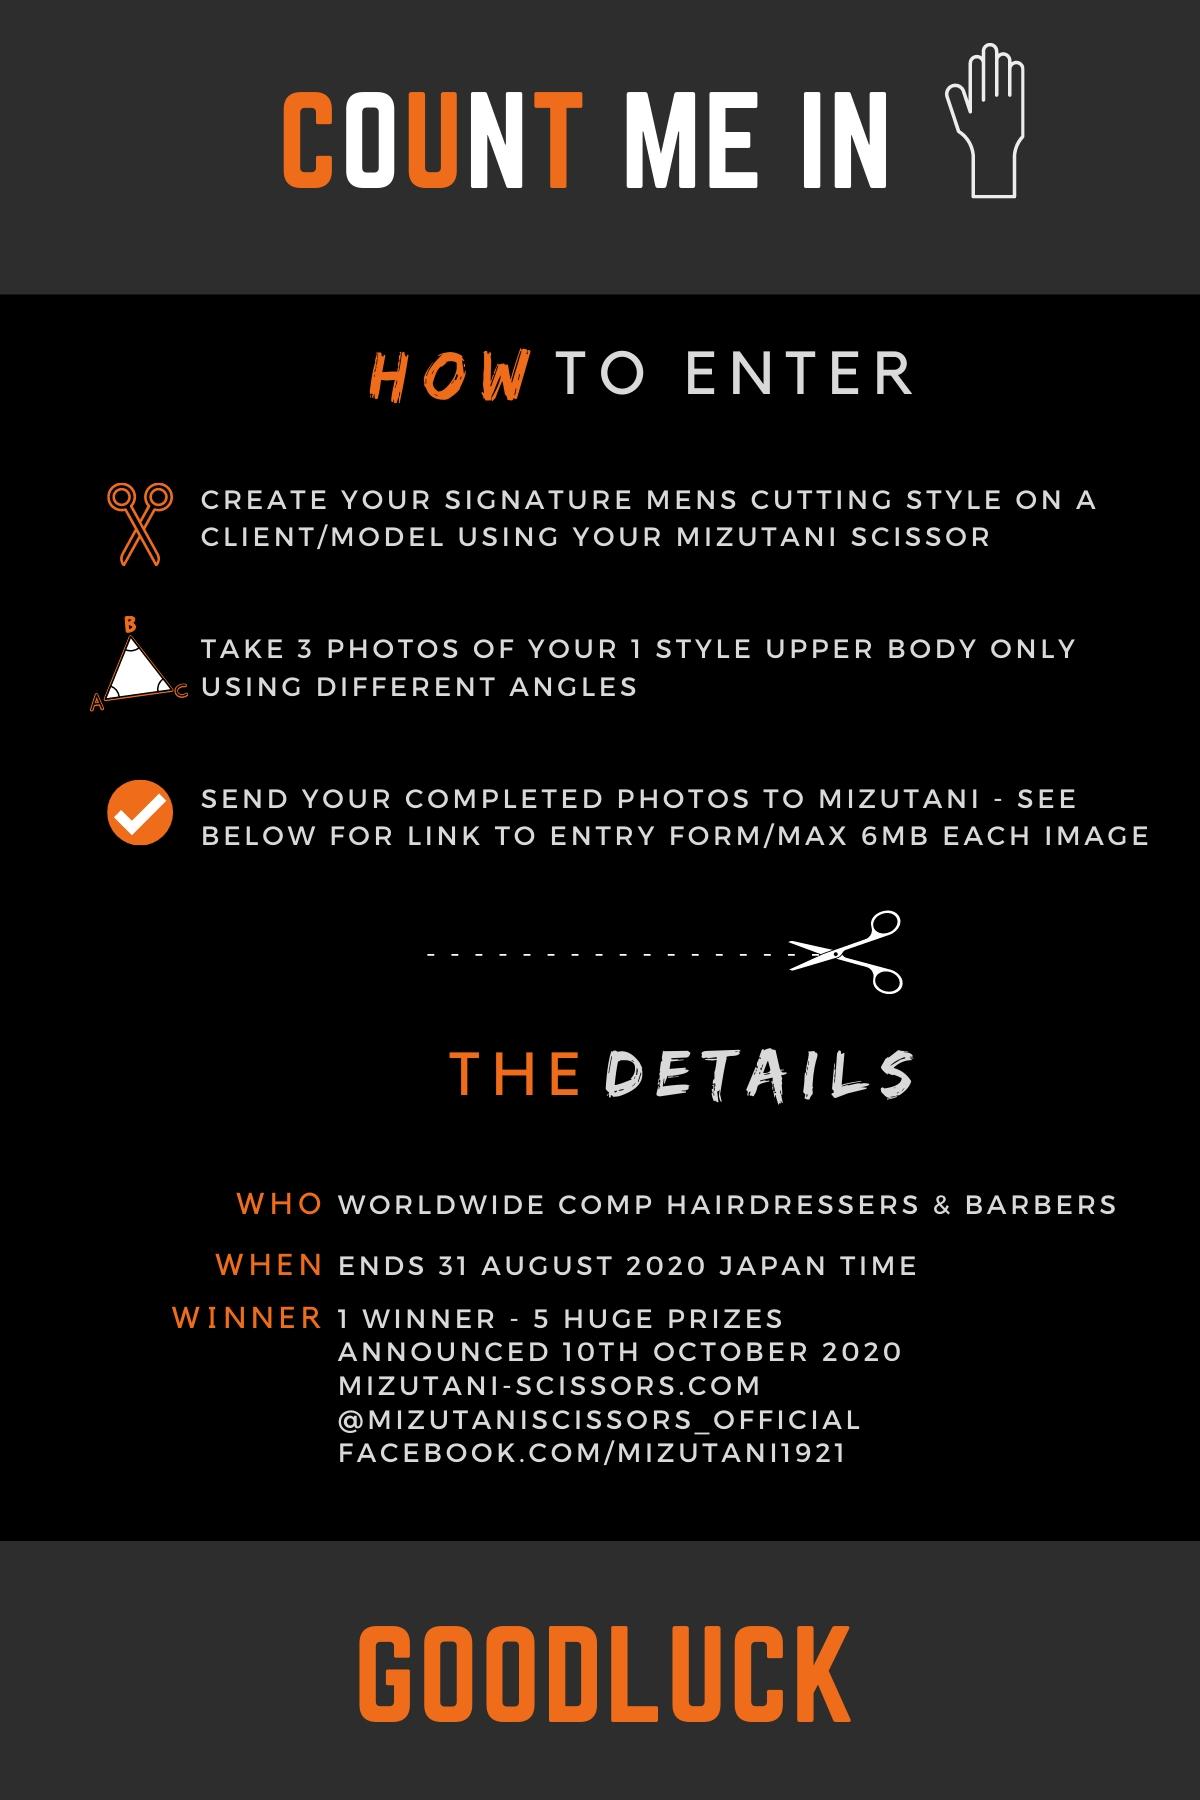 how-to-enter.jpg